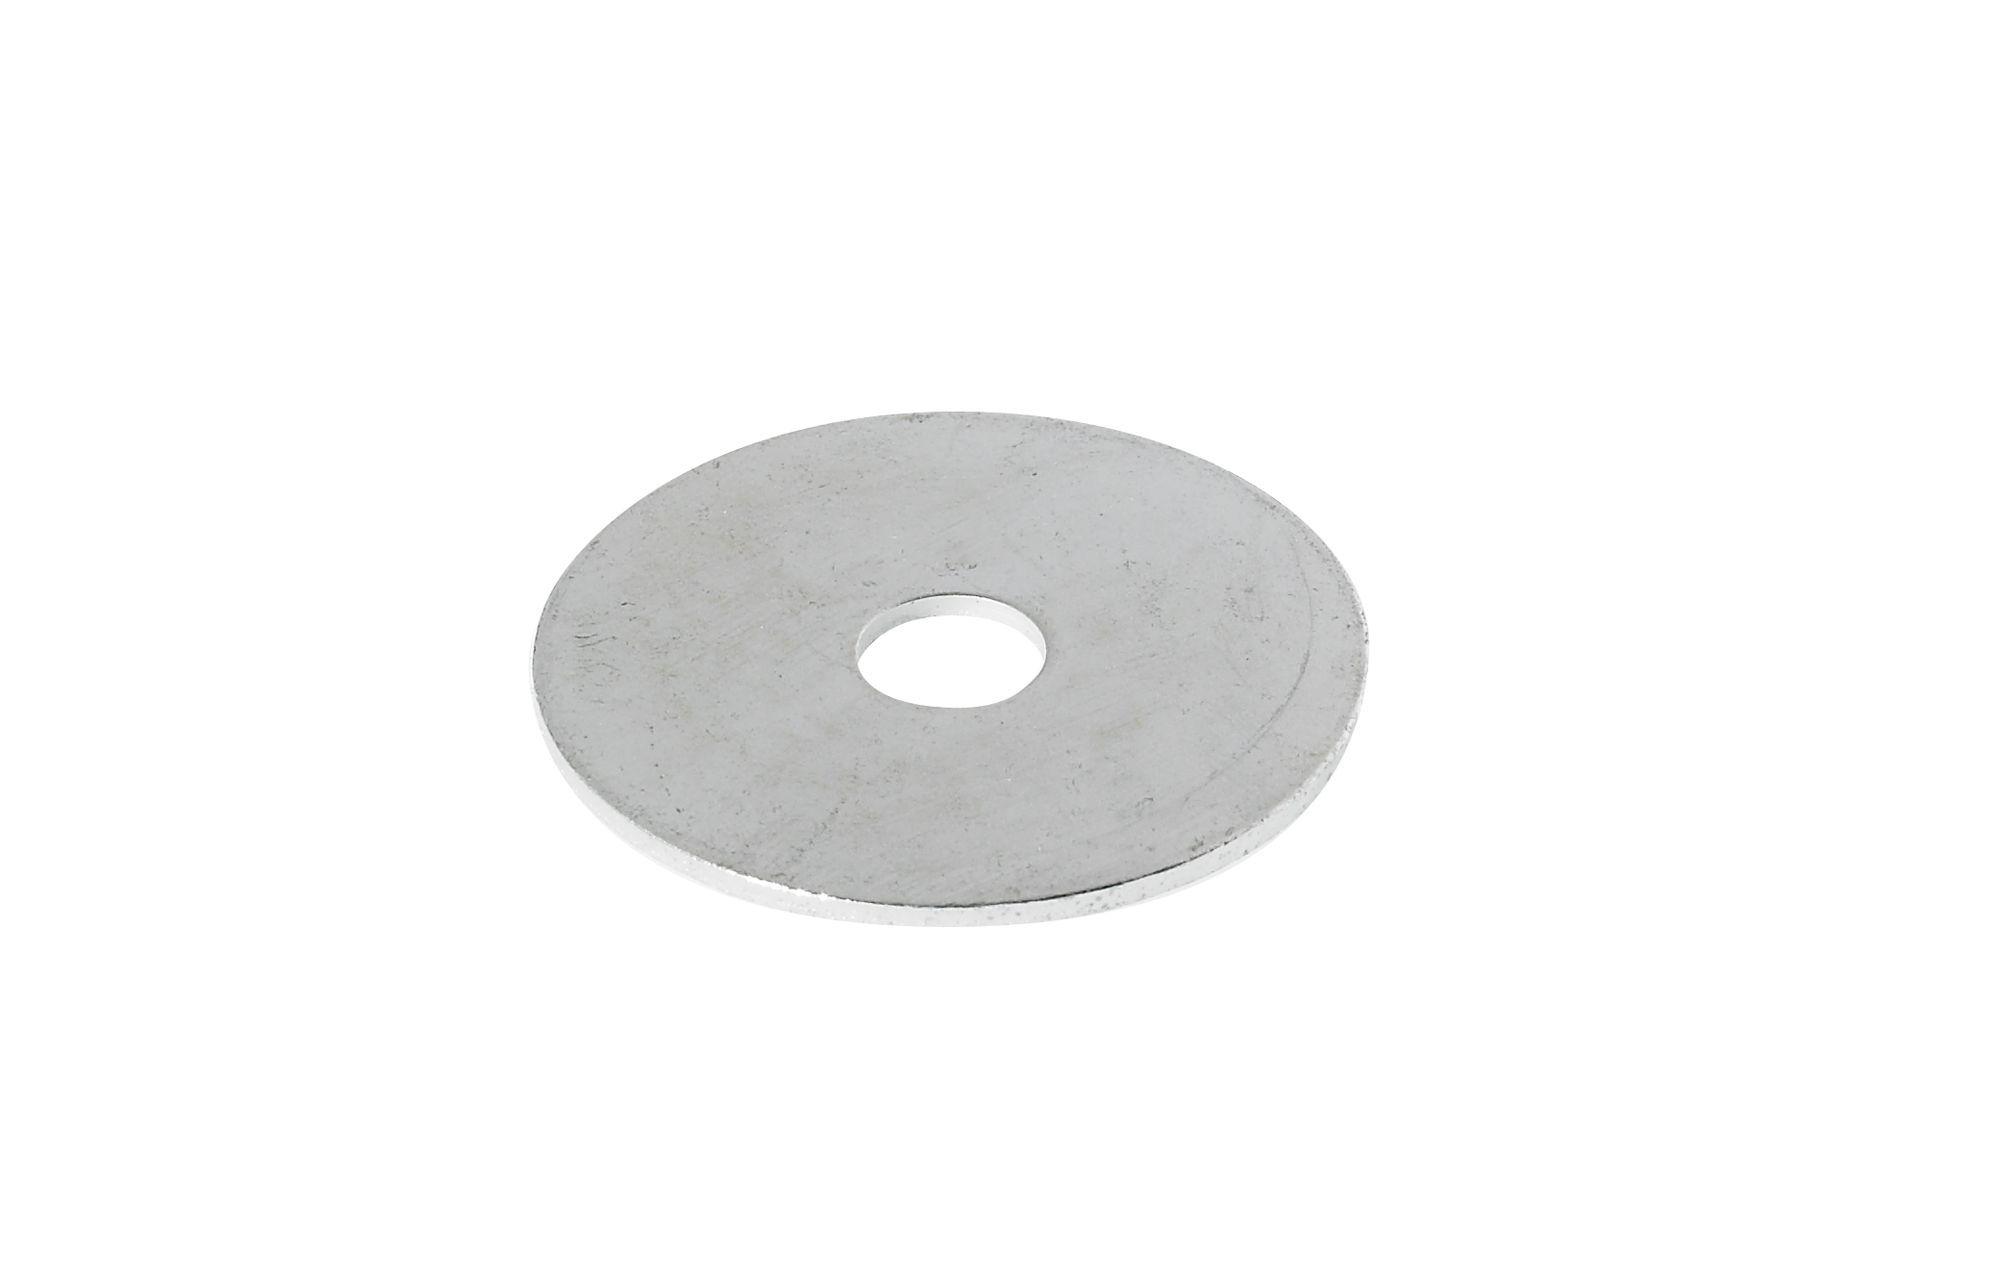 Avf M3.5 Steel Flat Washer, Pack Of 10